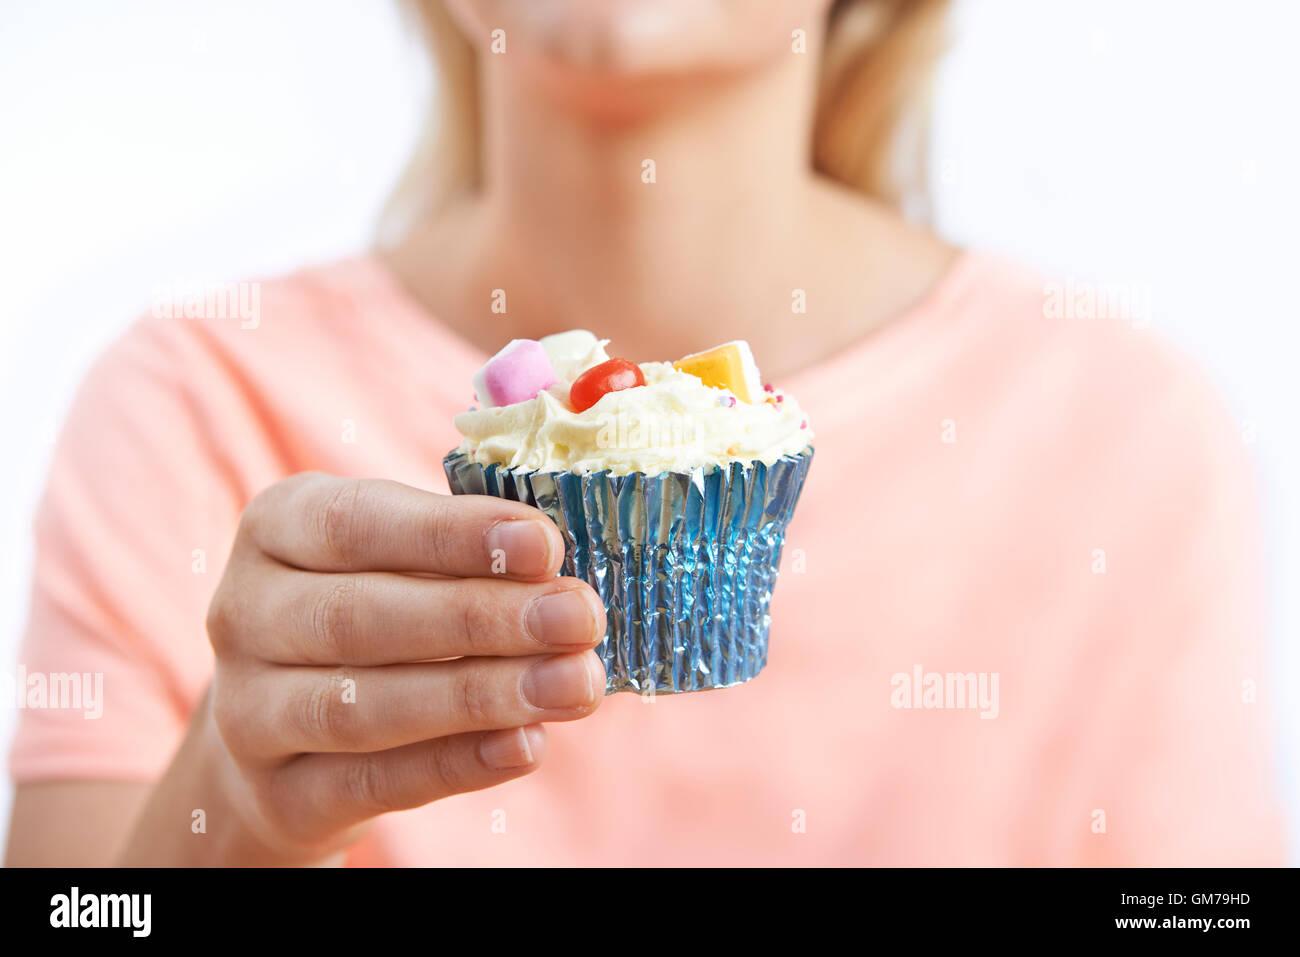 Frau mit ungesunden Cupcake hautnah Stockbild